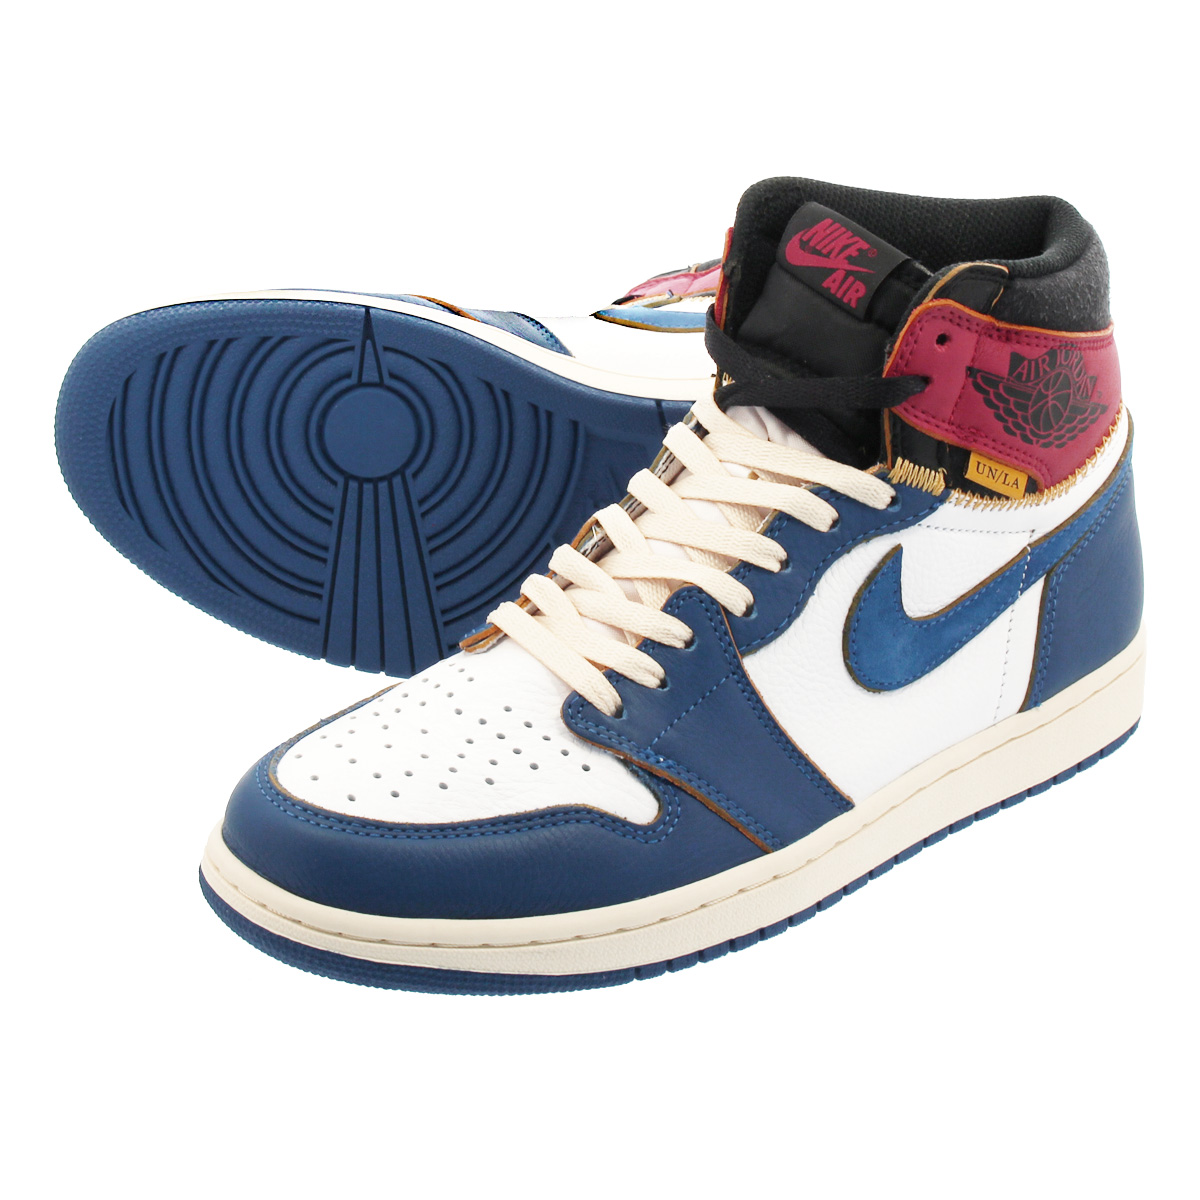 a9a66ae4439 LOWTEX PLUS  NIKE AIR JORDAN 1 RETRO HIGH OG NRG Nike Air Jordan 1  nostalgic high OG NRG union WHITE STORM BLUE VARSITY RED BLACK bv1300-146